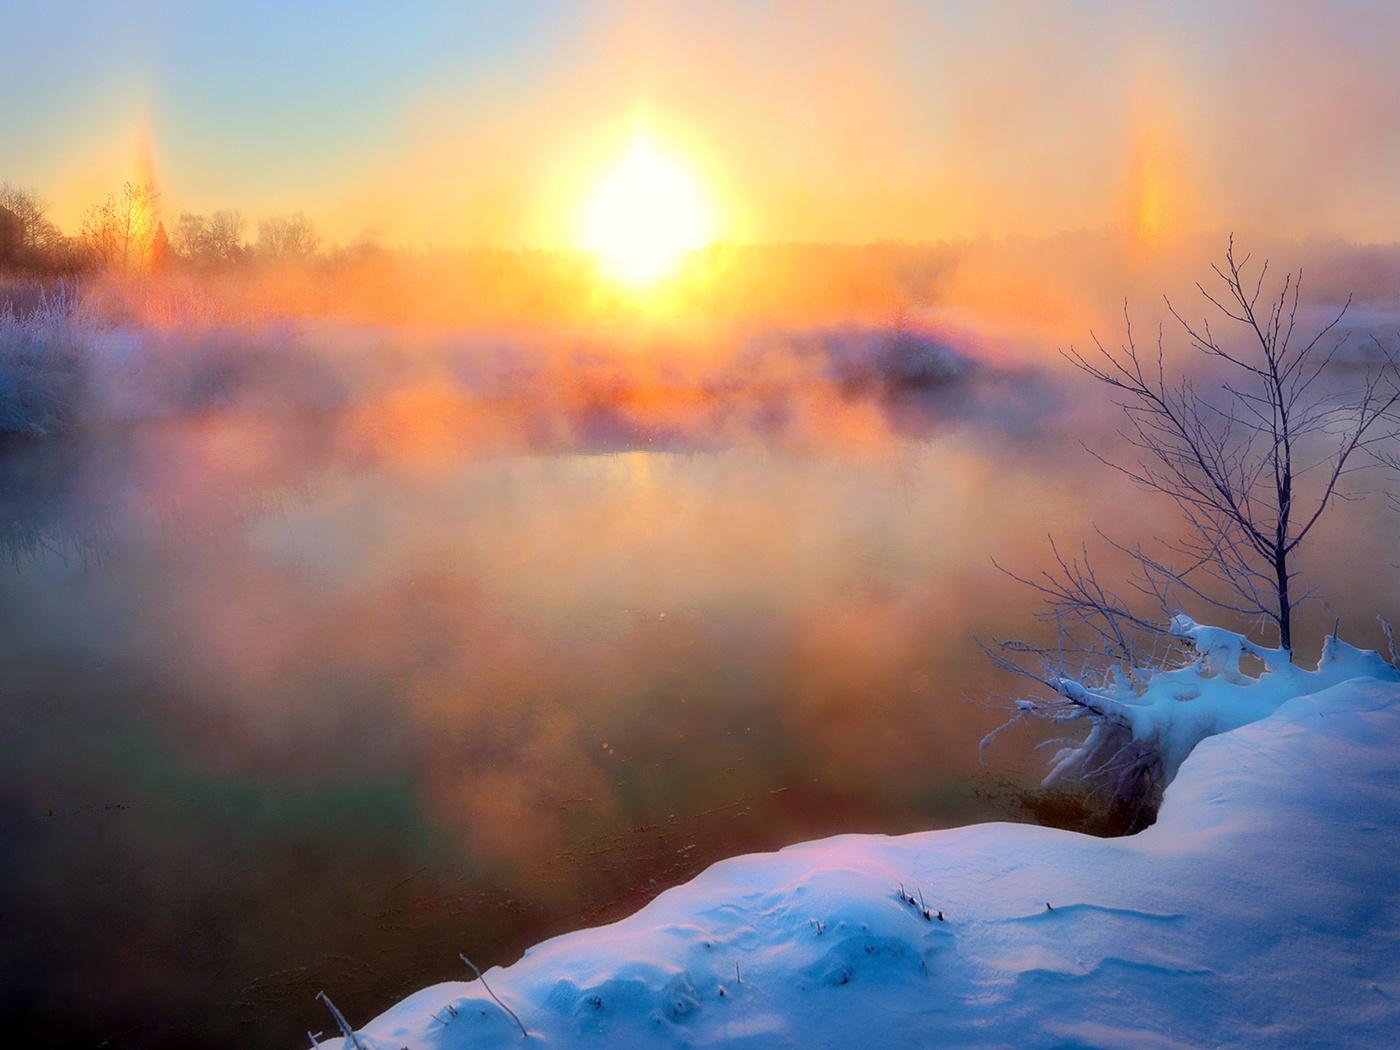 утро солнце снег картинки